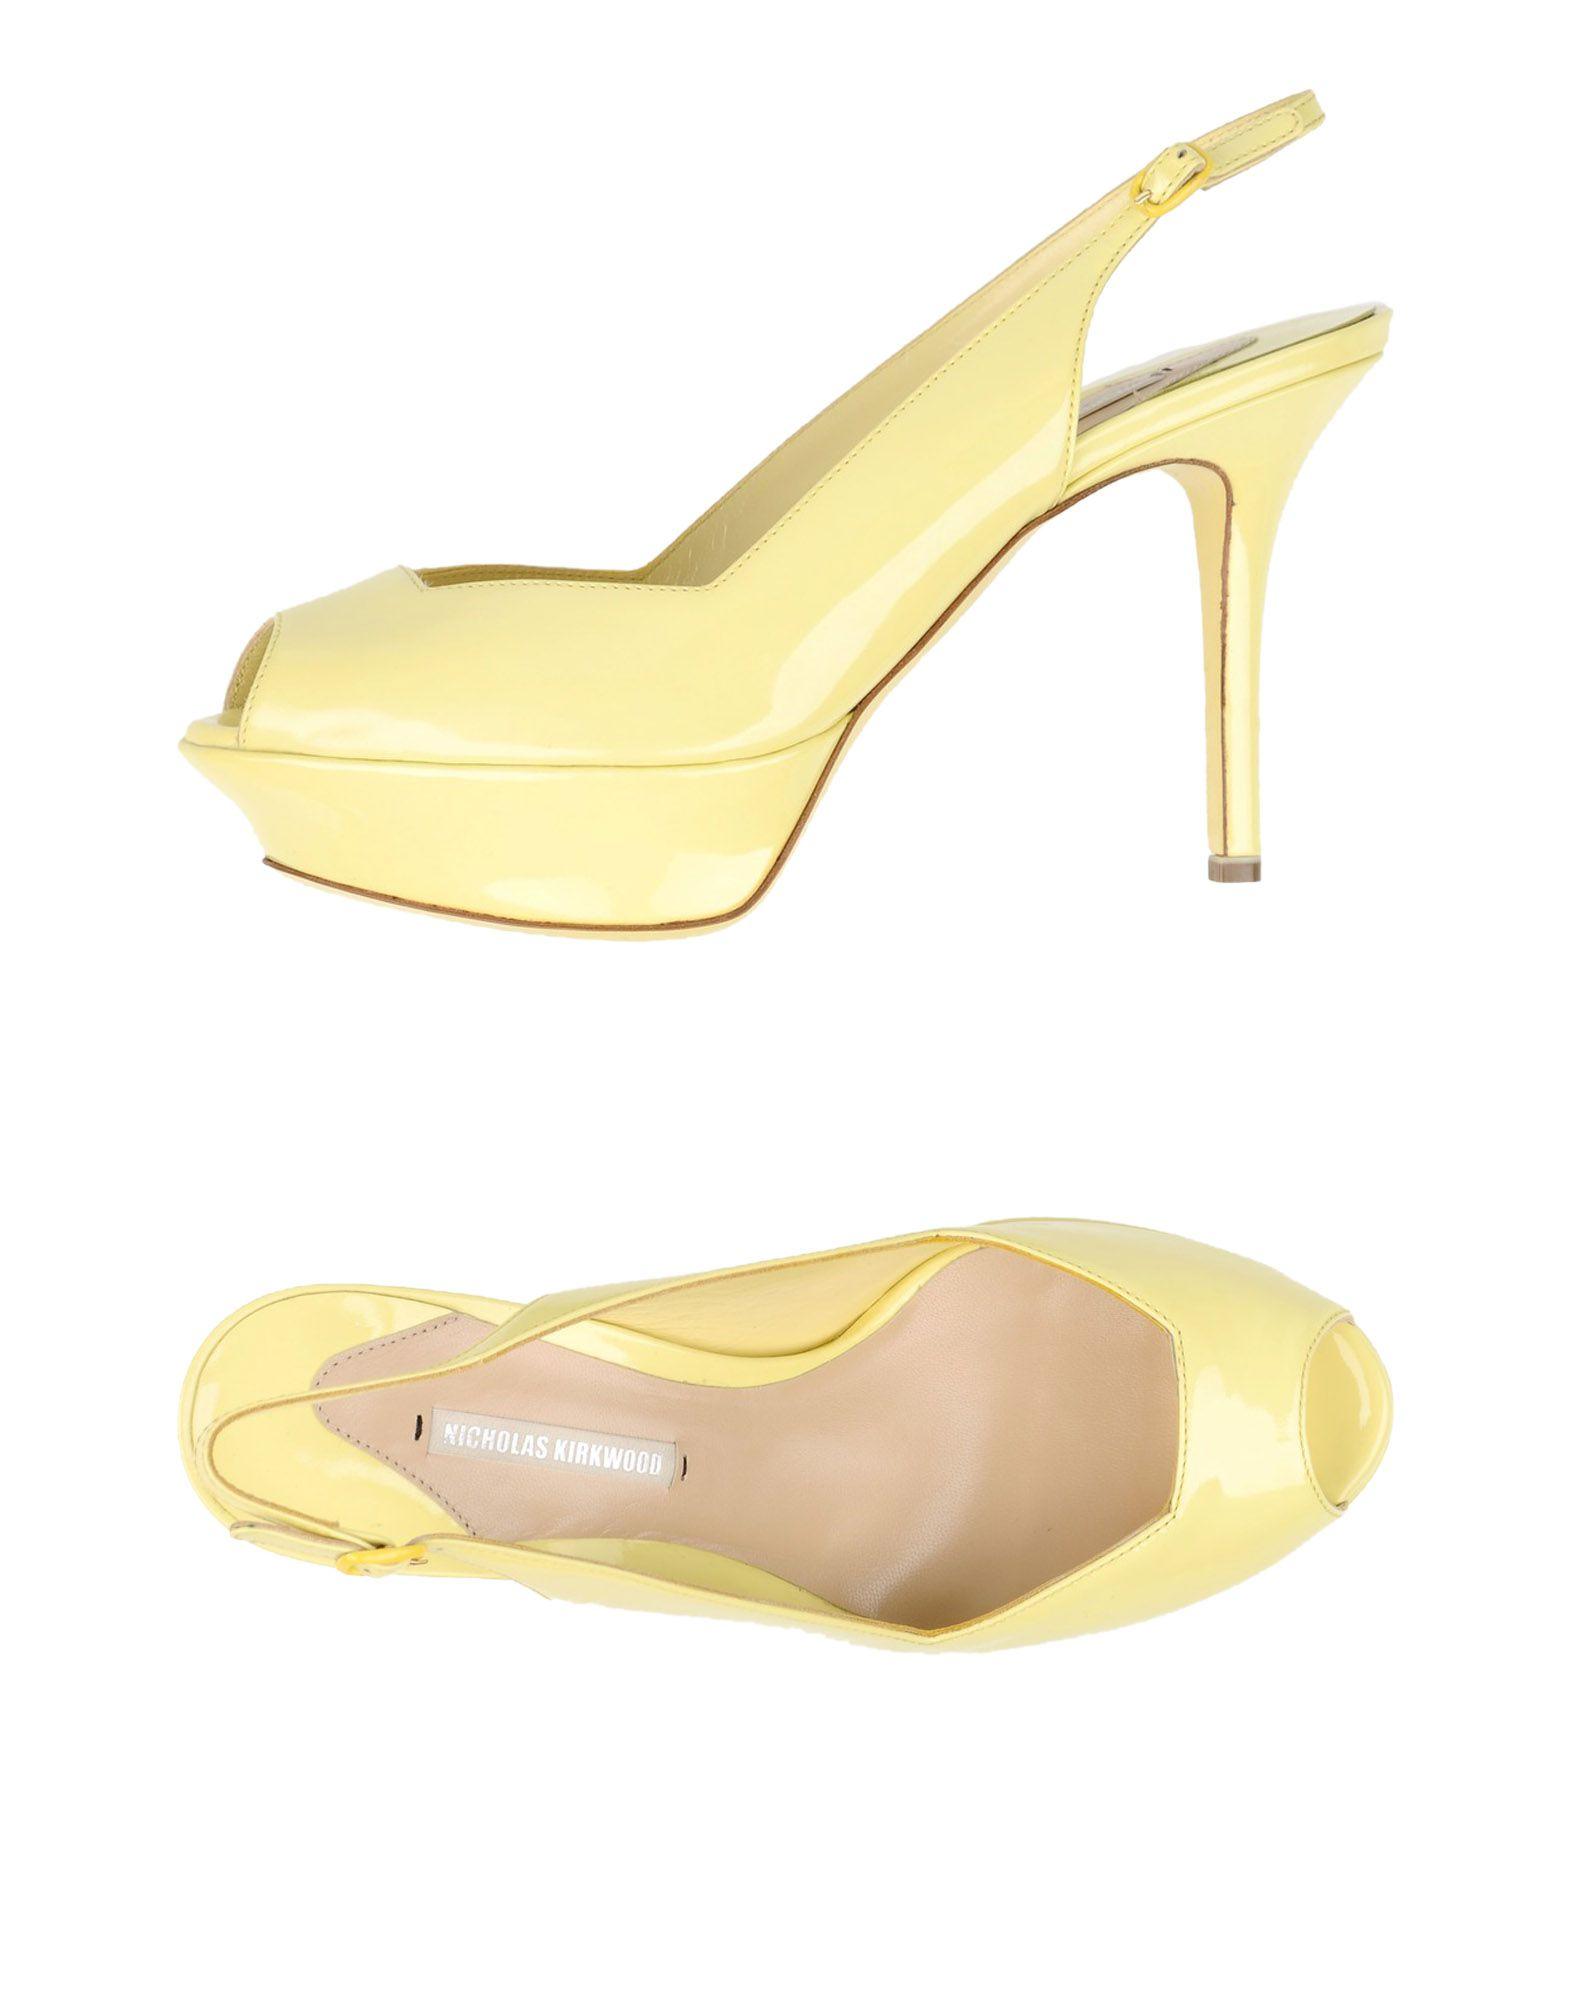 Nicholas Kirkwood Sandalen Damen  11365738PCGut aussehende strapazierfähige Schuhe